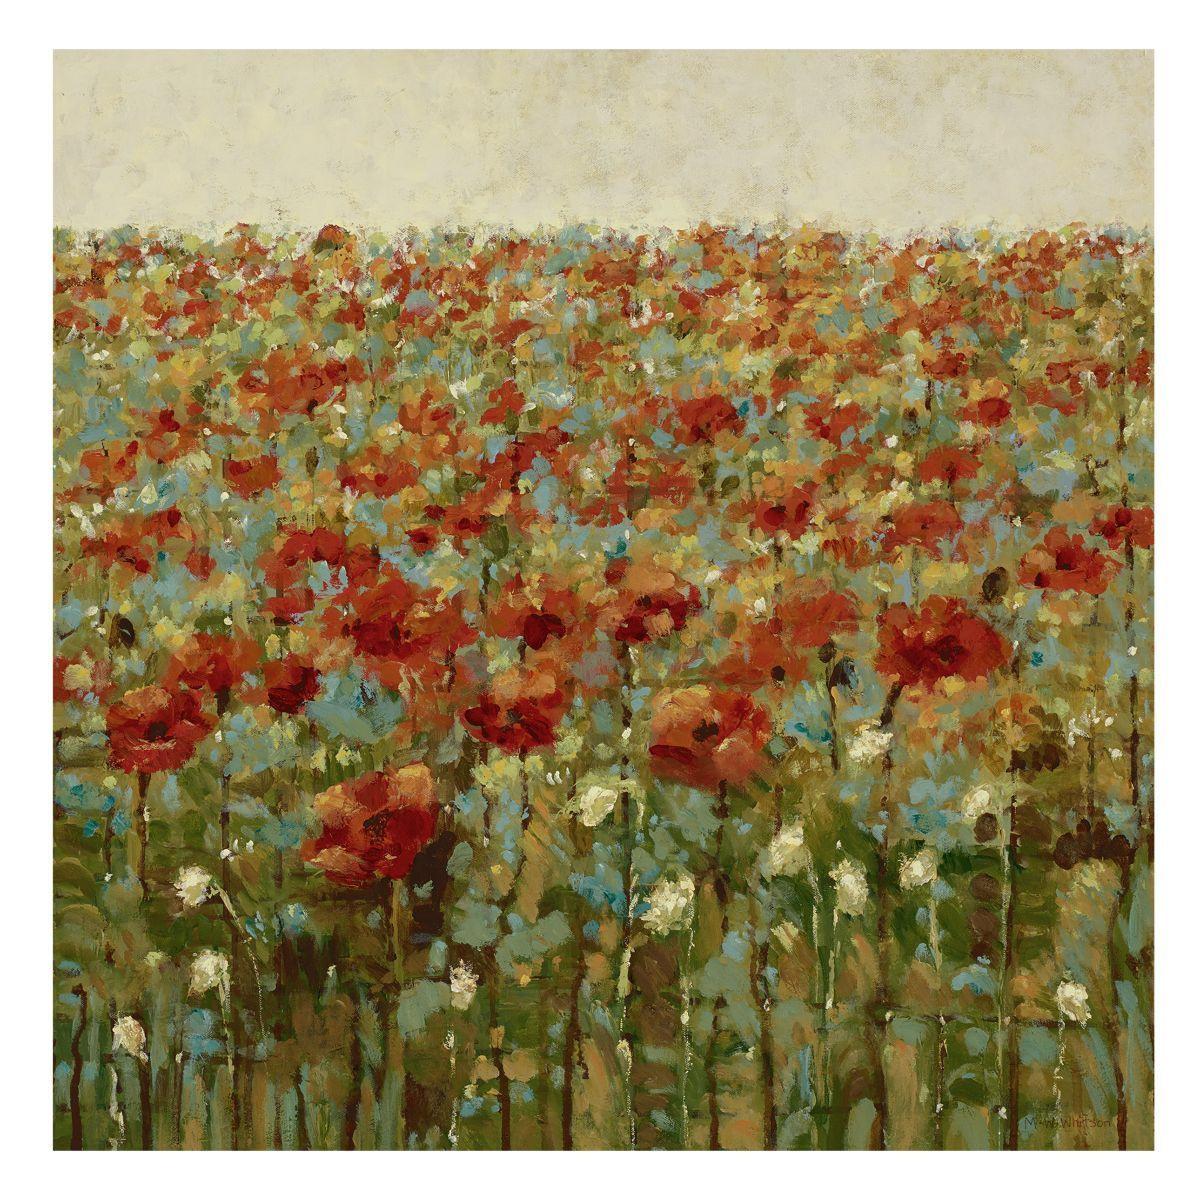 29 Fantastic Van Gogh Poppies Vase 2021 free download van gogh poppies vase of lovely wall art poppies kunuzmetals com in wall art poppies beautiful field of poppies giclee print hair pinterest giclee print